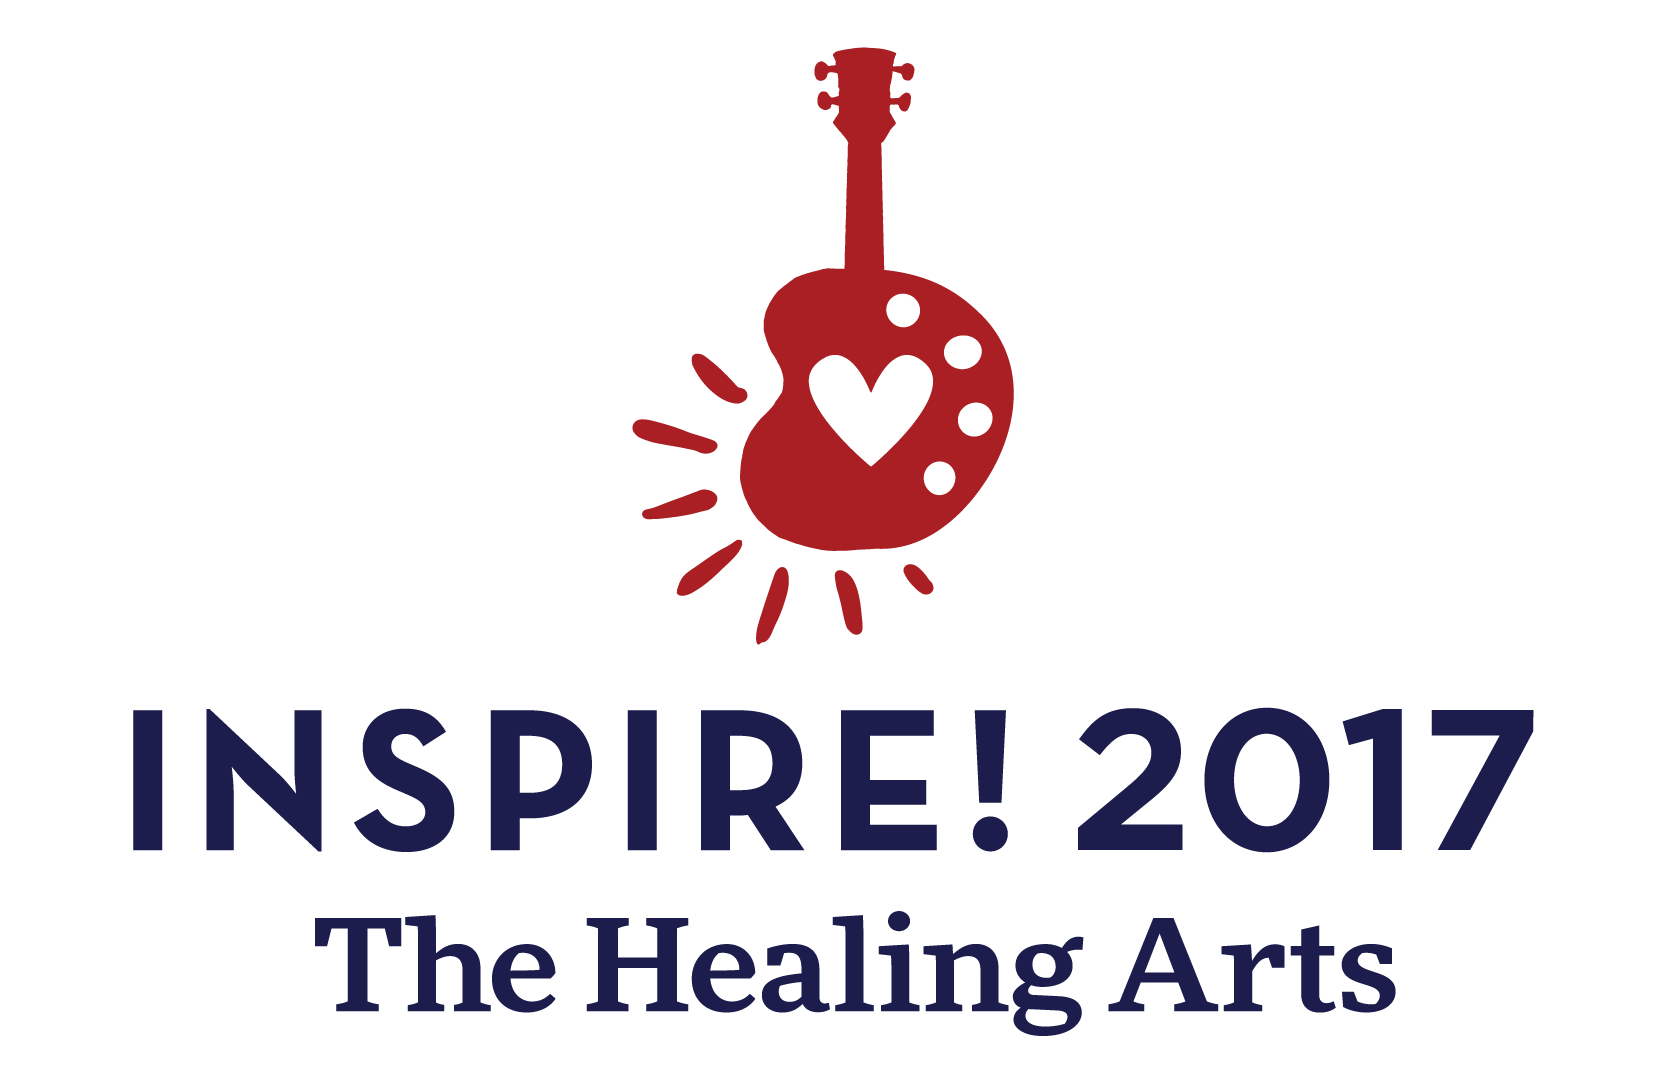 healing_arts_concept_logo